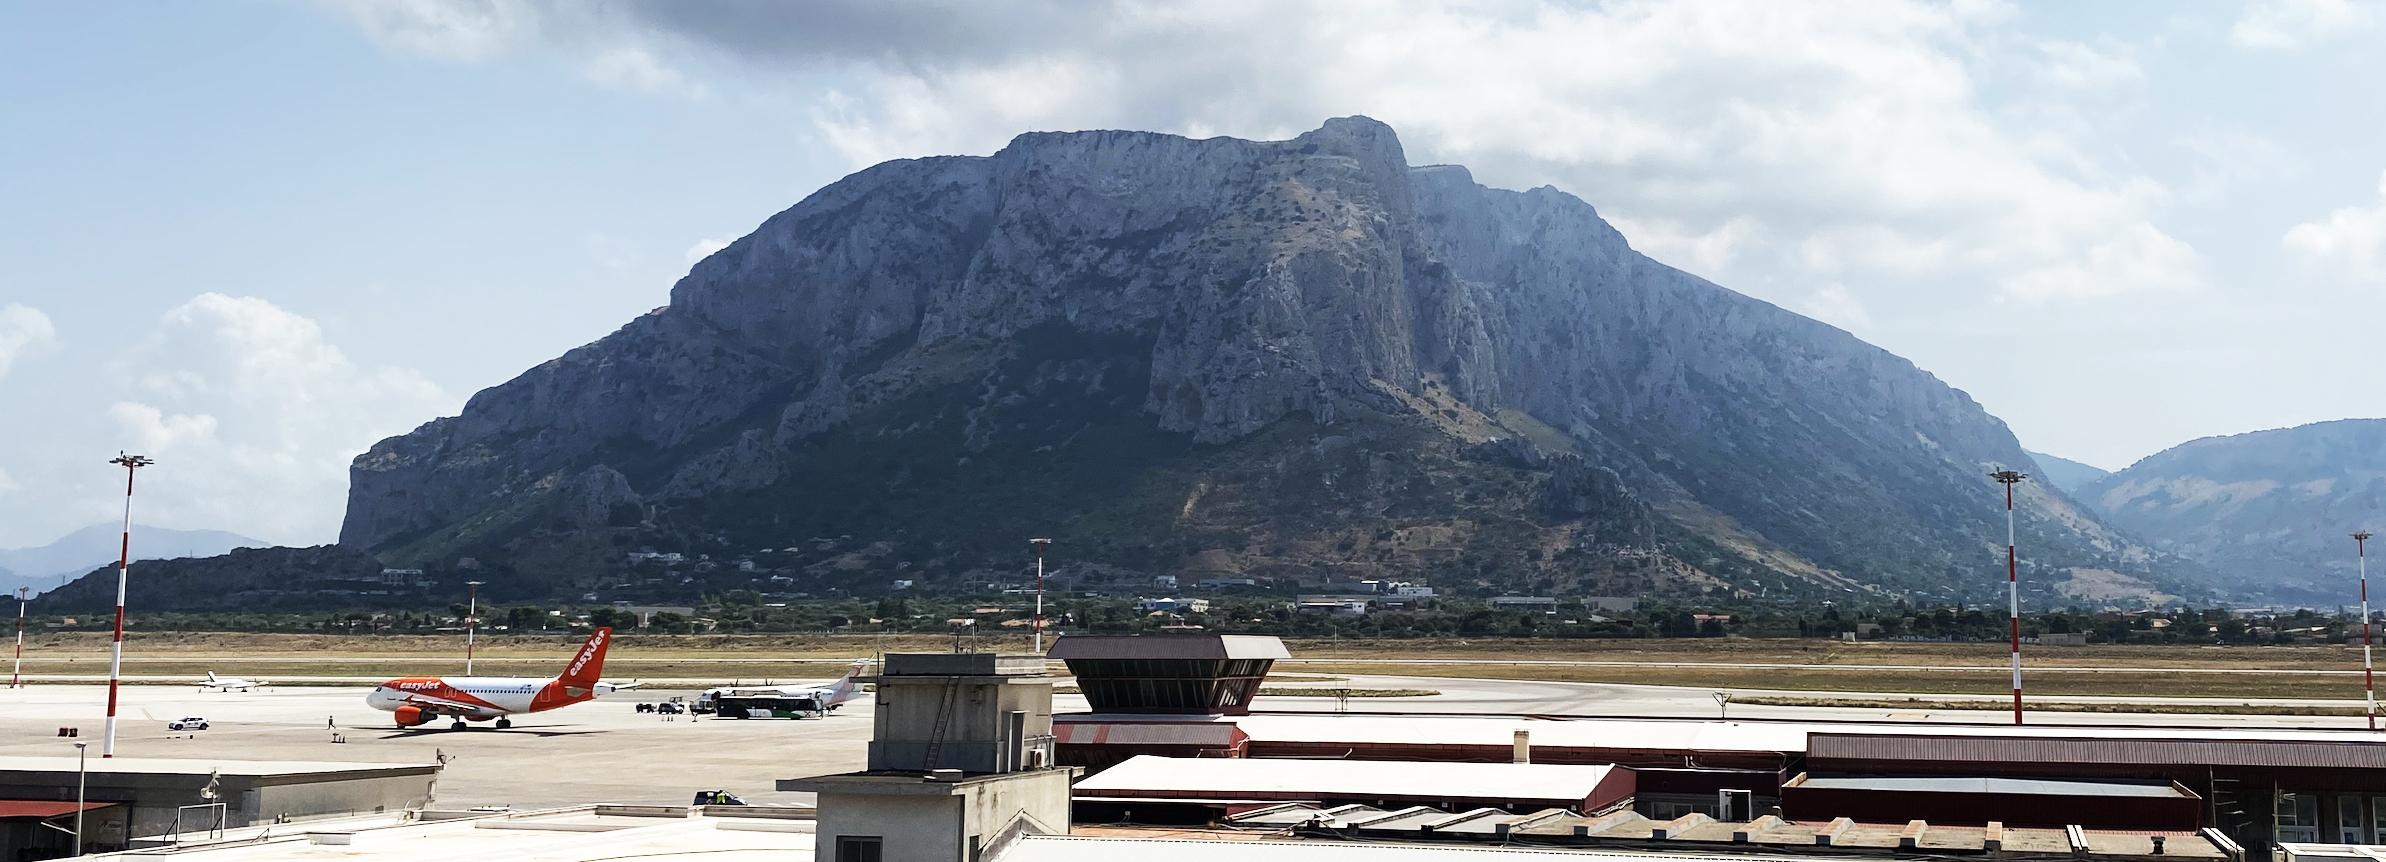 """The Fundamentals of Airport Marketing"" – Natale Chieppa, Giovanni Scalia, and Philip Kotler"